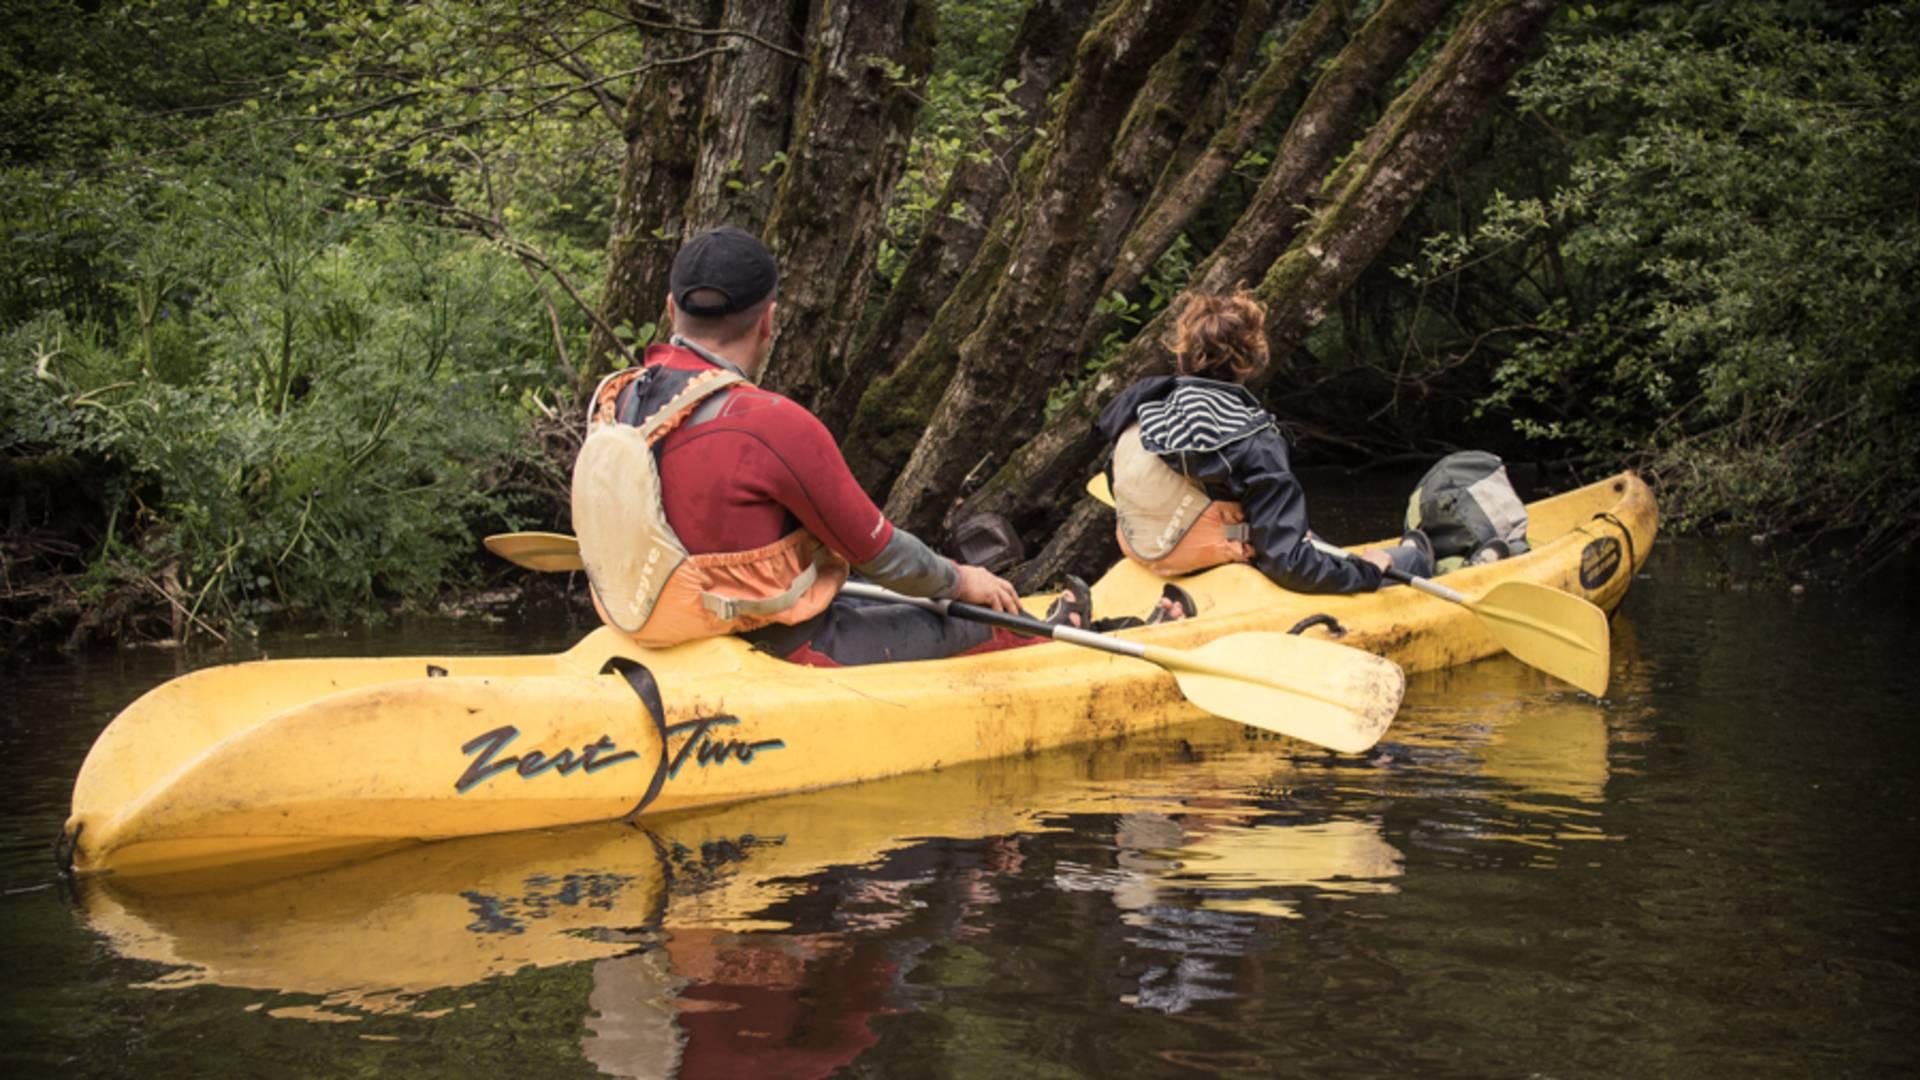 Station sports et nature à Belle-Isle-en-Terre - kayak